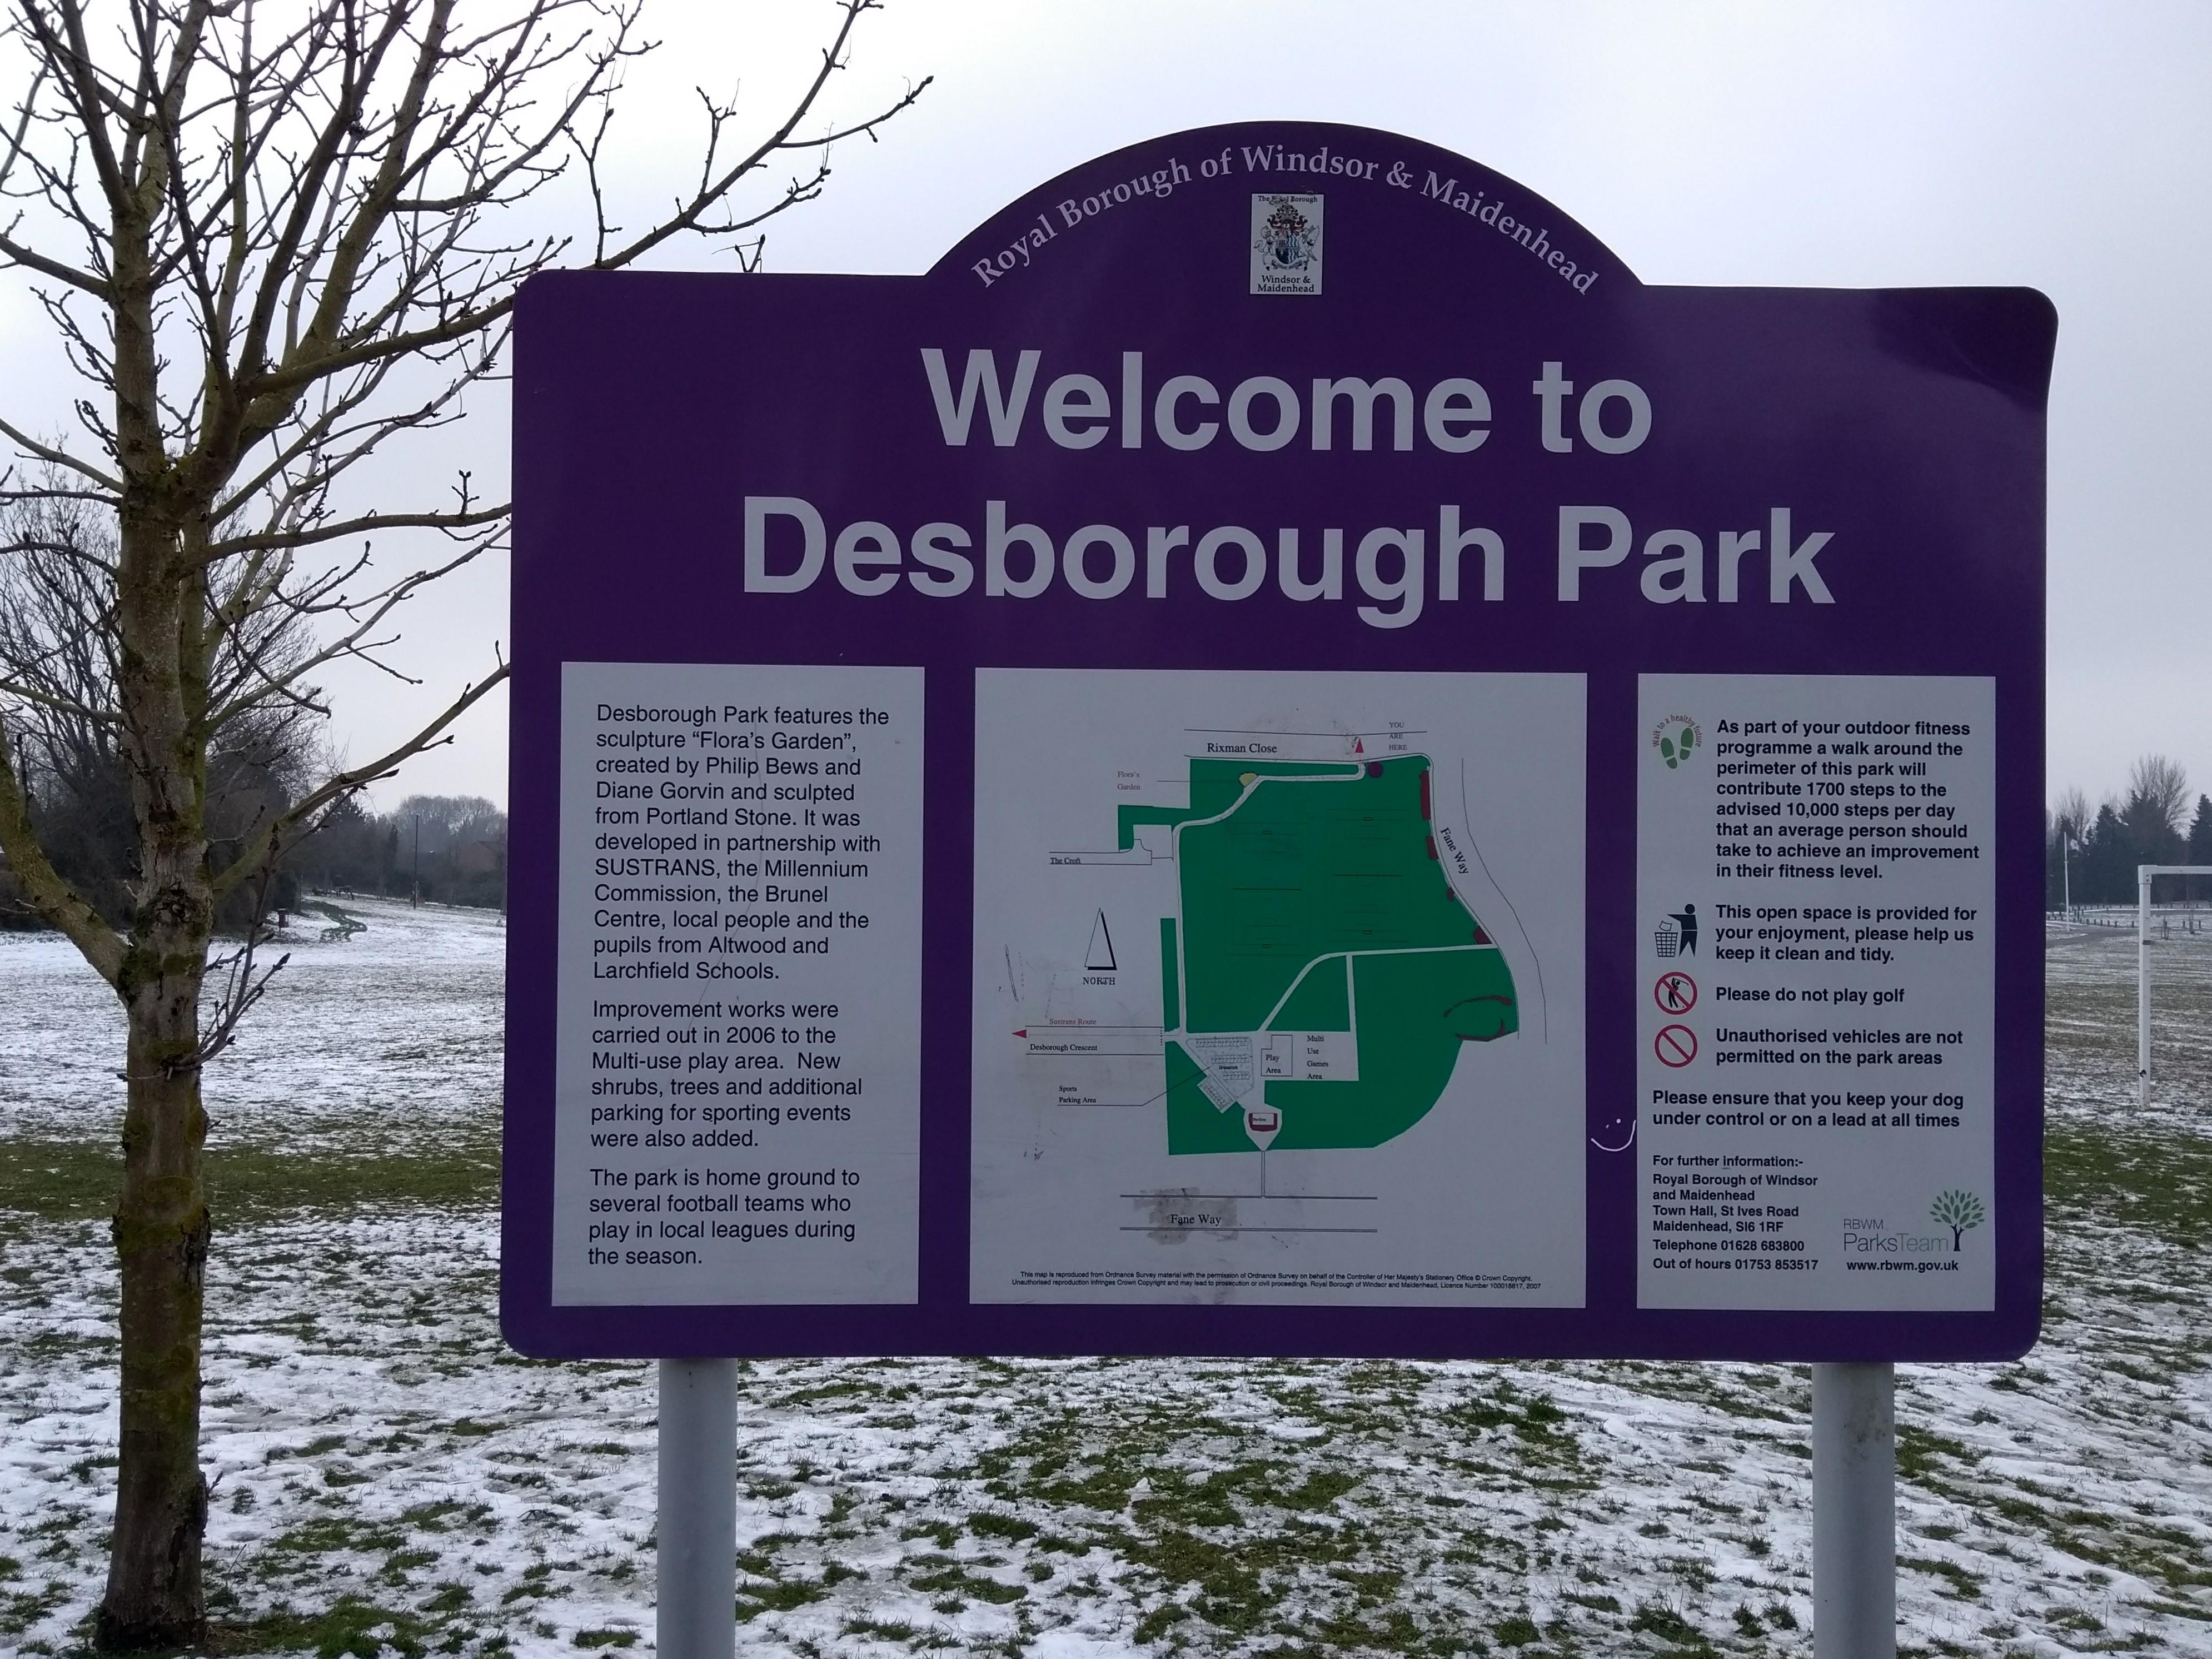 Welcome to Desborough Park